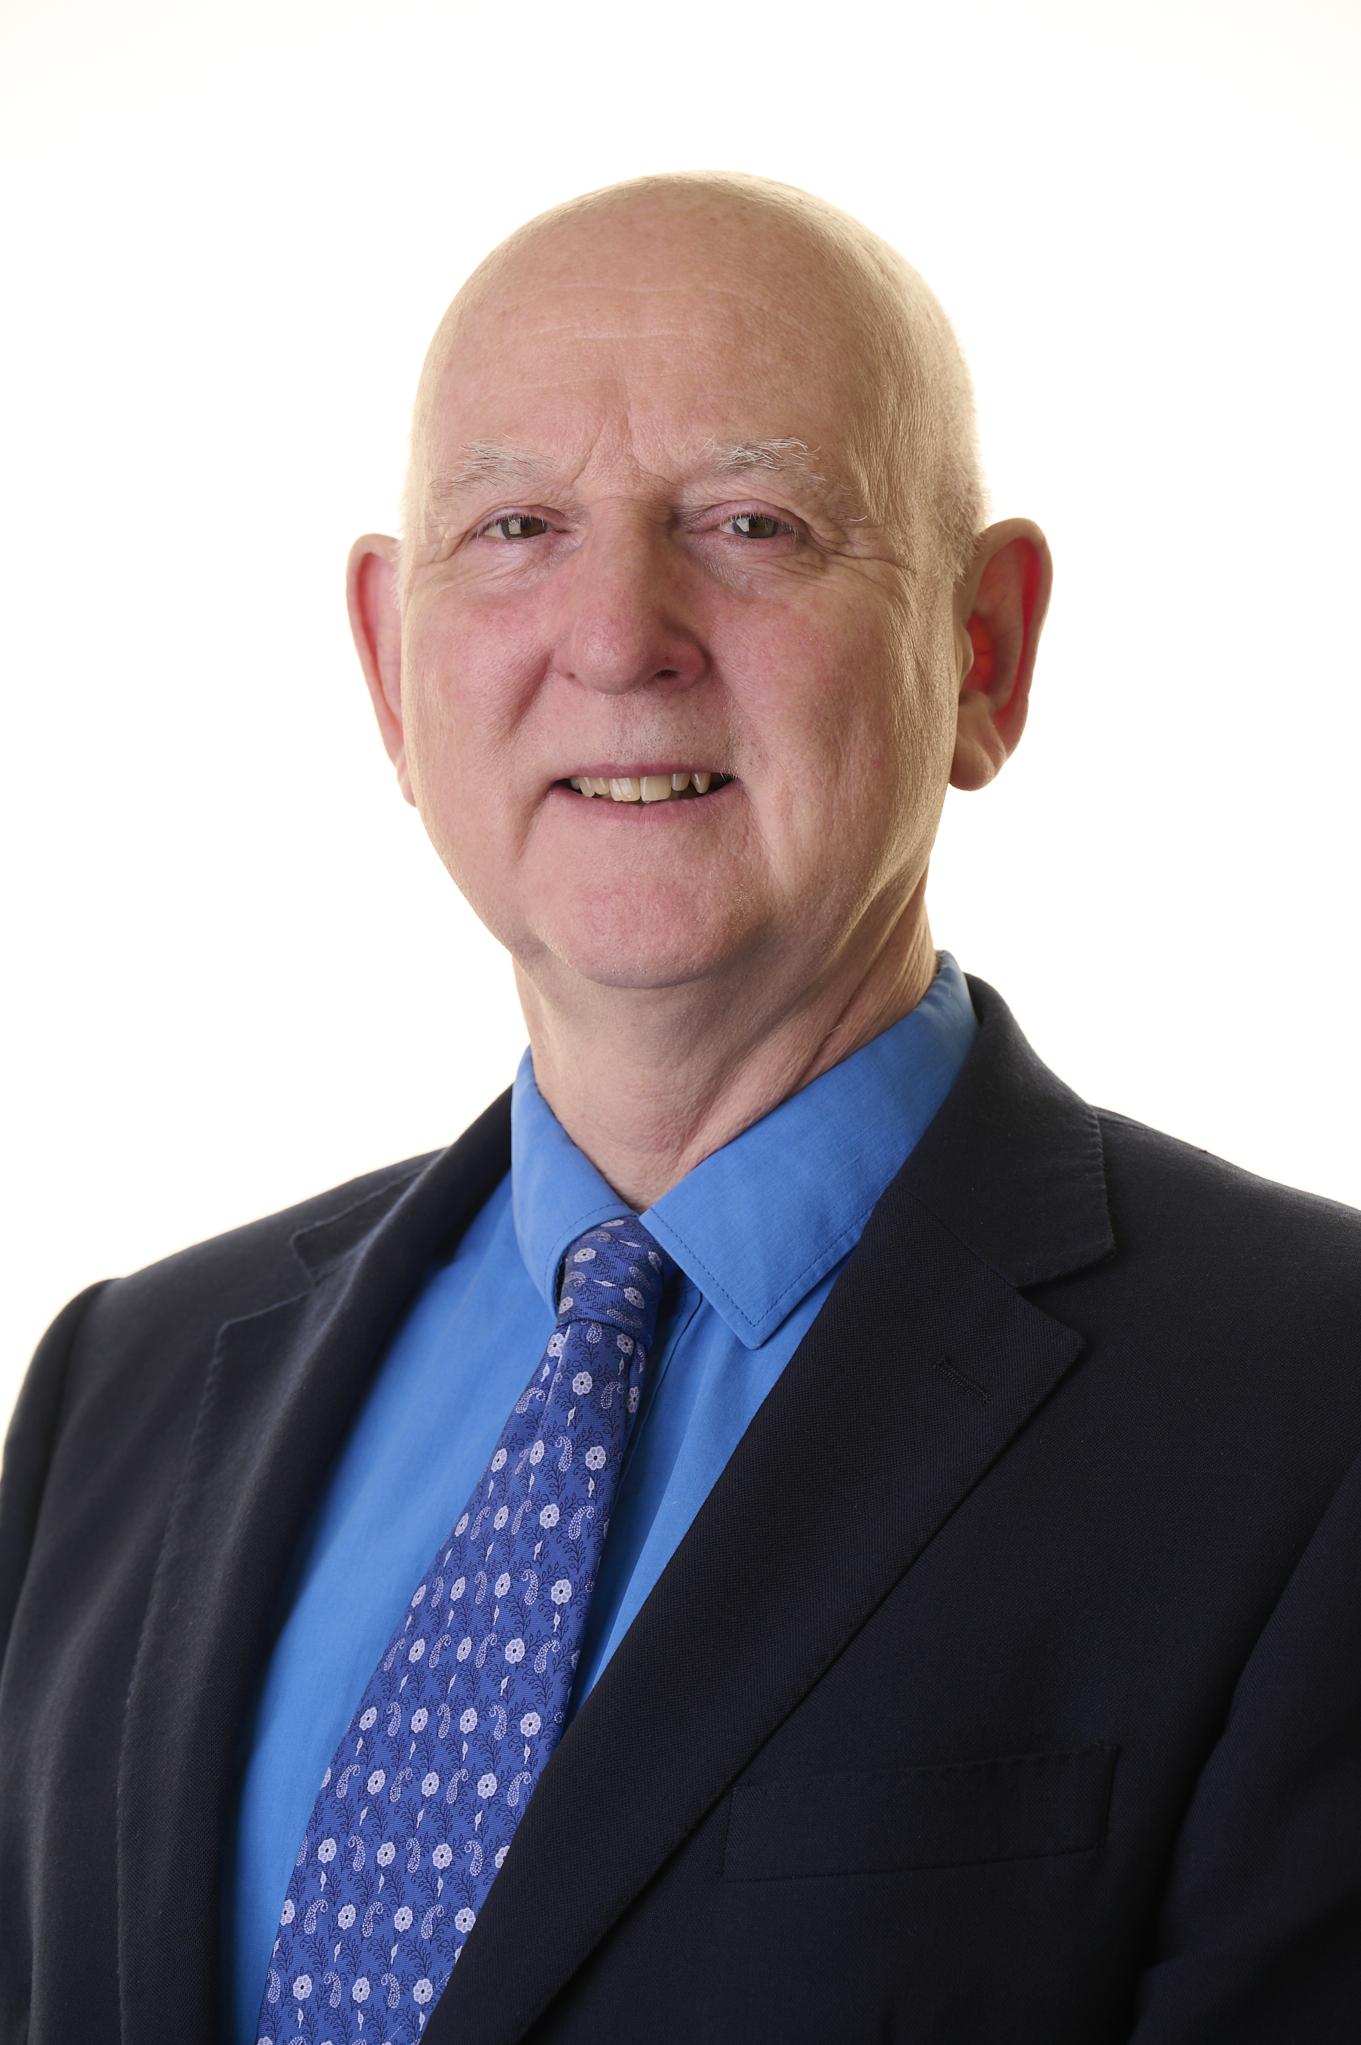 David Chalcraft